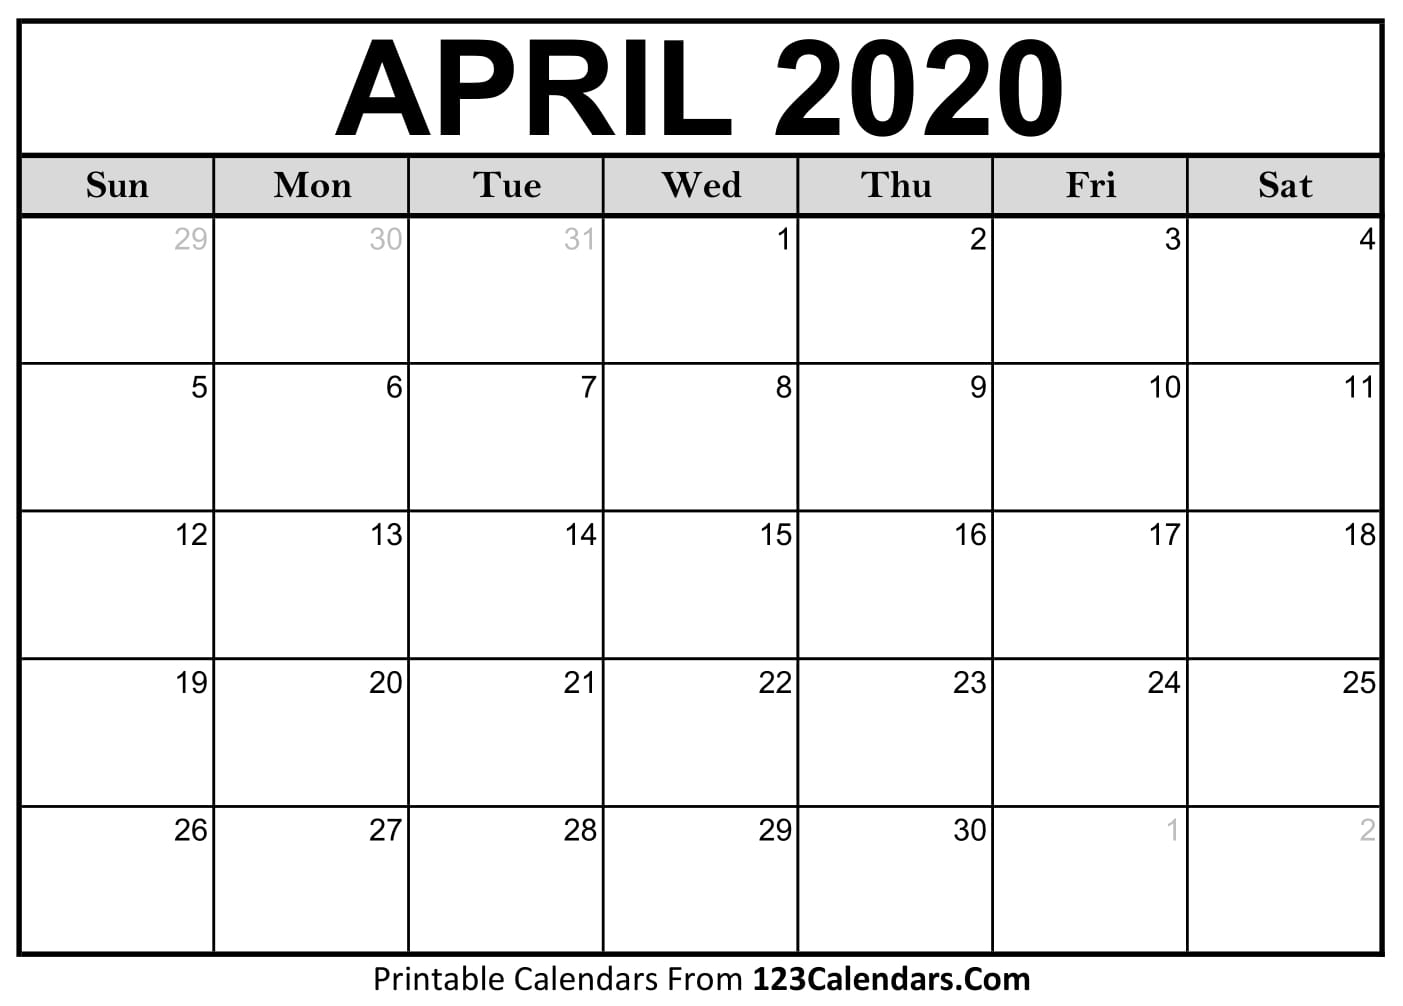 Printable Calendars April 2020  Bolan.horizonconsulting.co pertaining to April 2020 Printable Calendar